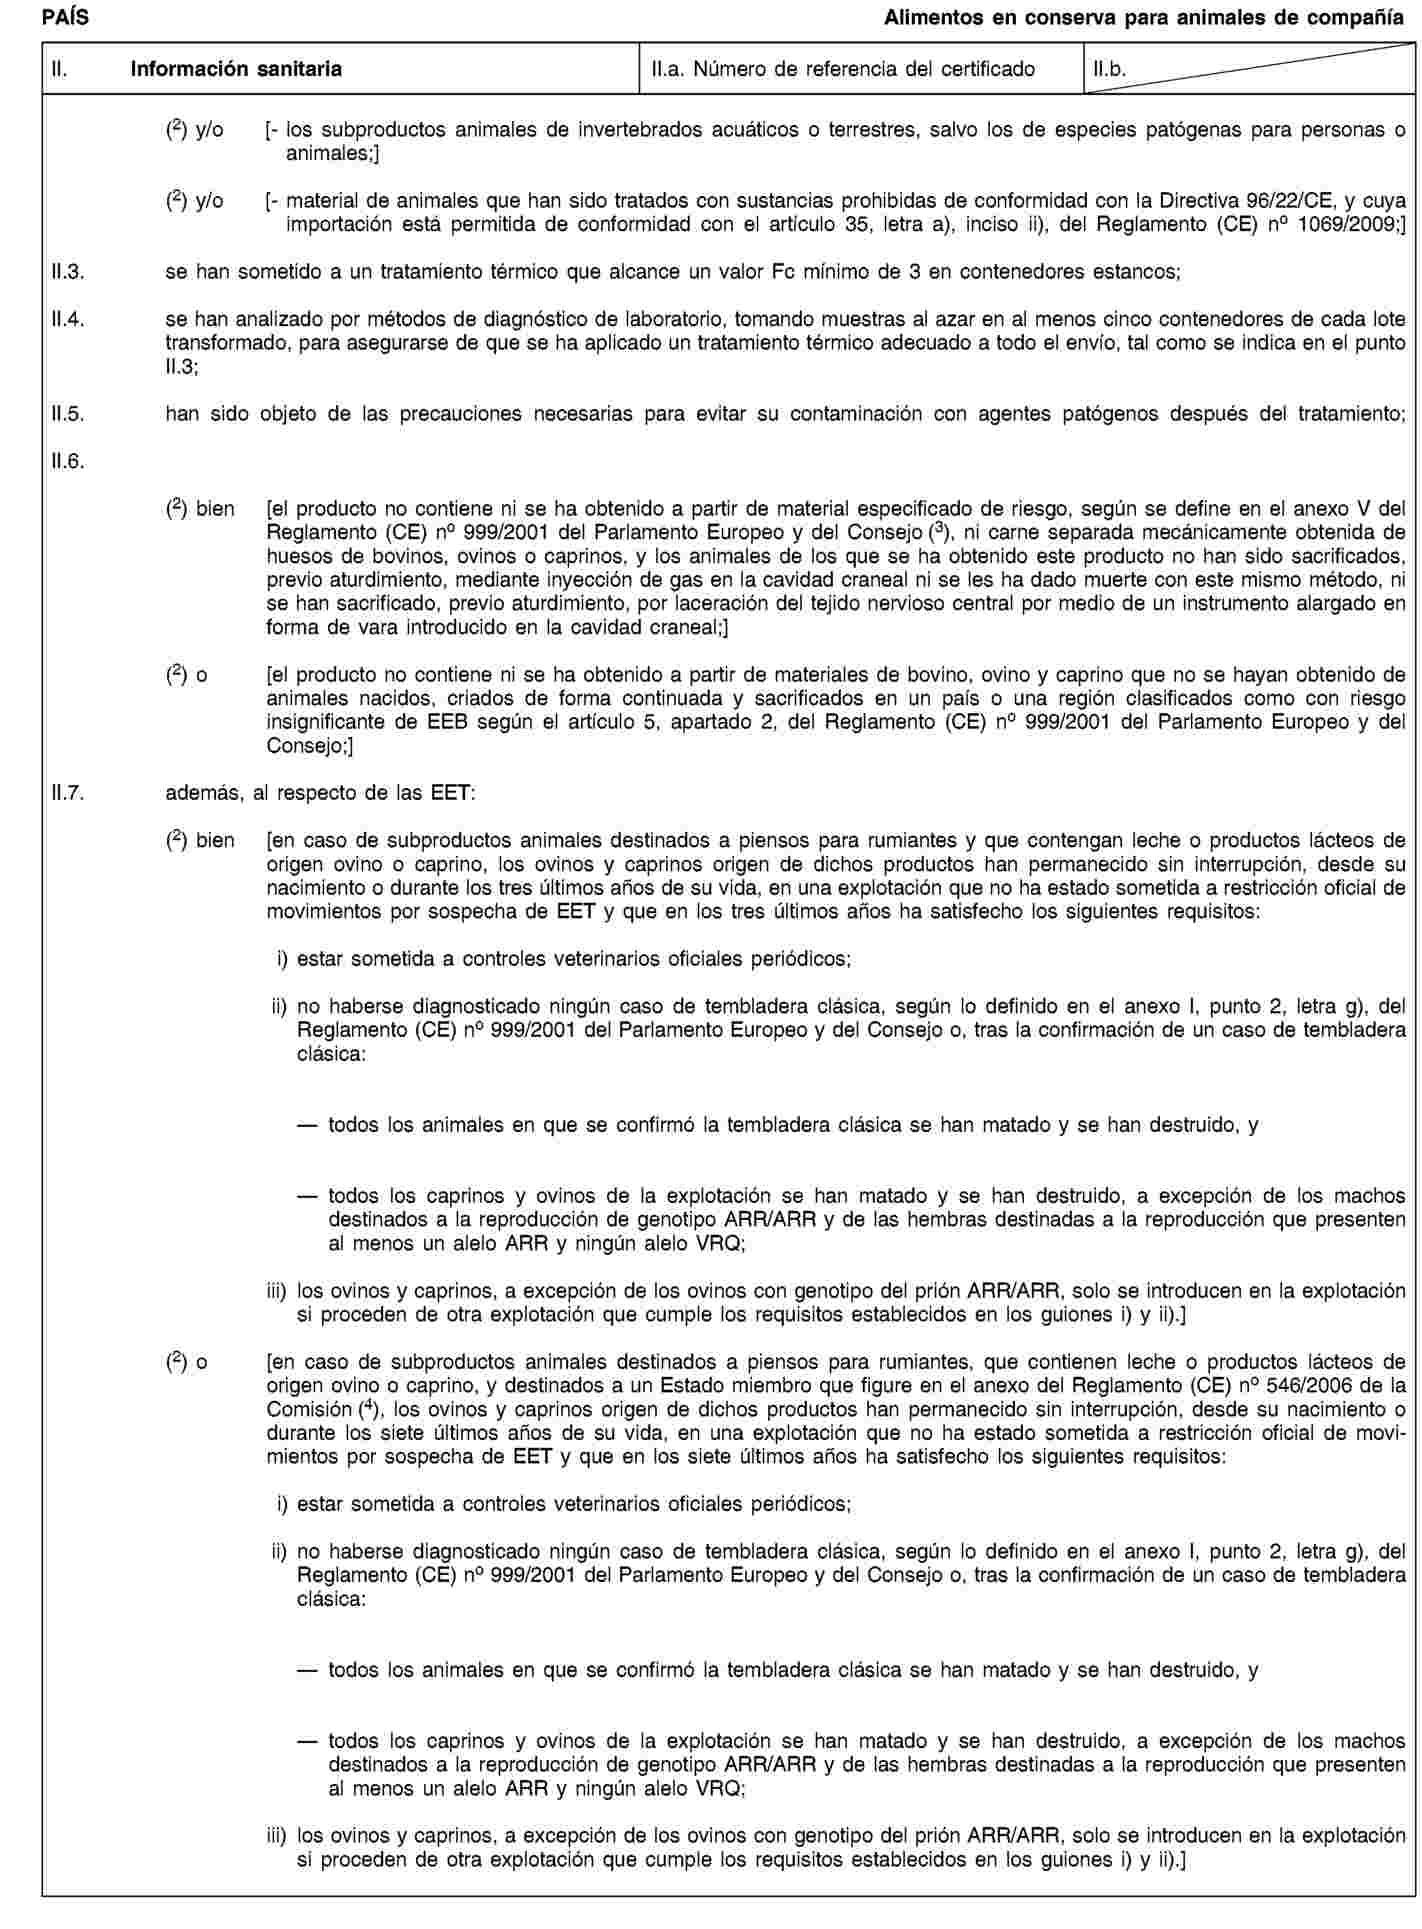 Imagen: https://eur-lex.europa.eu/resource.html?uri=uriserv:OJ.L_.2011.054.01.0001.01.SPA.xhtml.L_2011054ES.01013401.tif.jpg